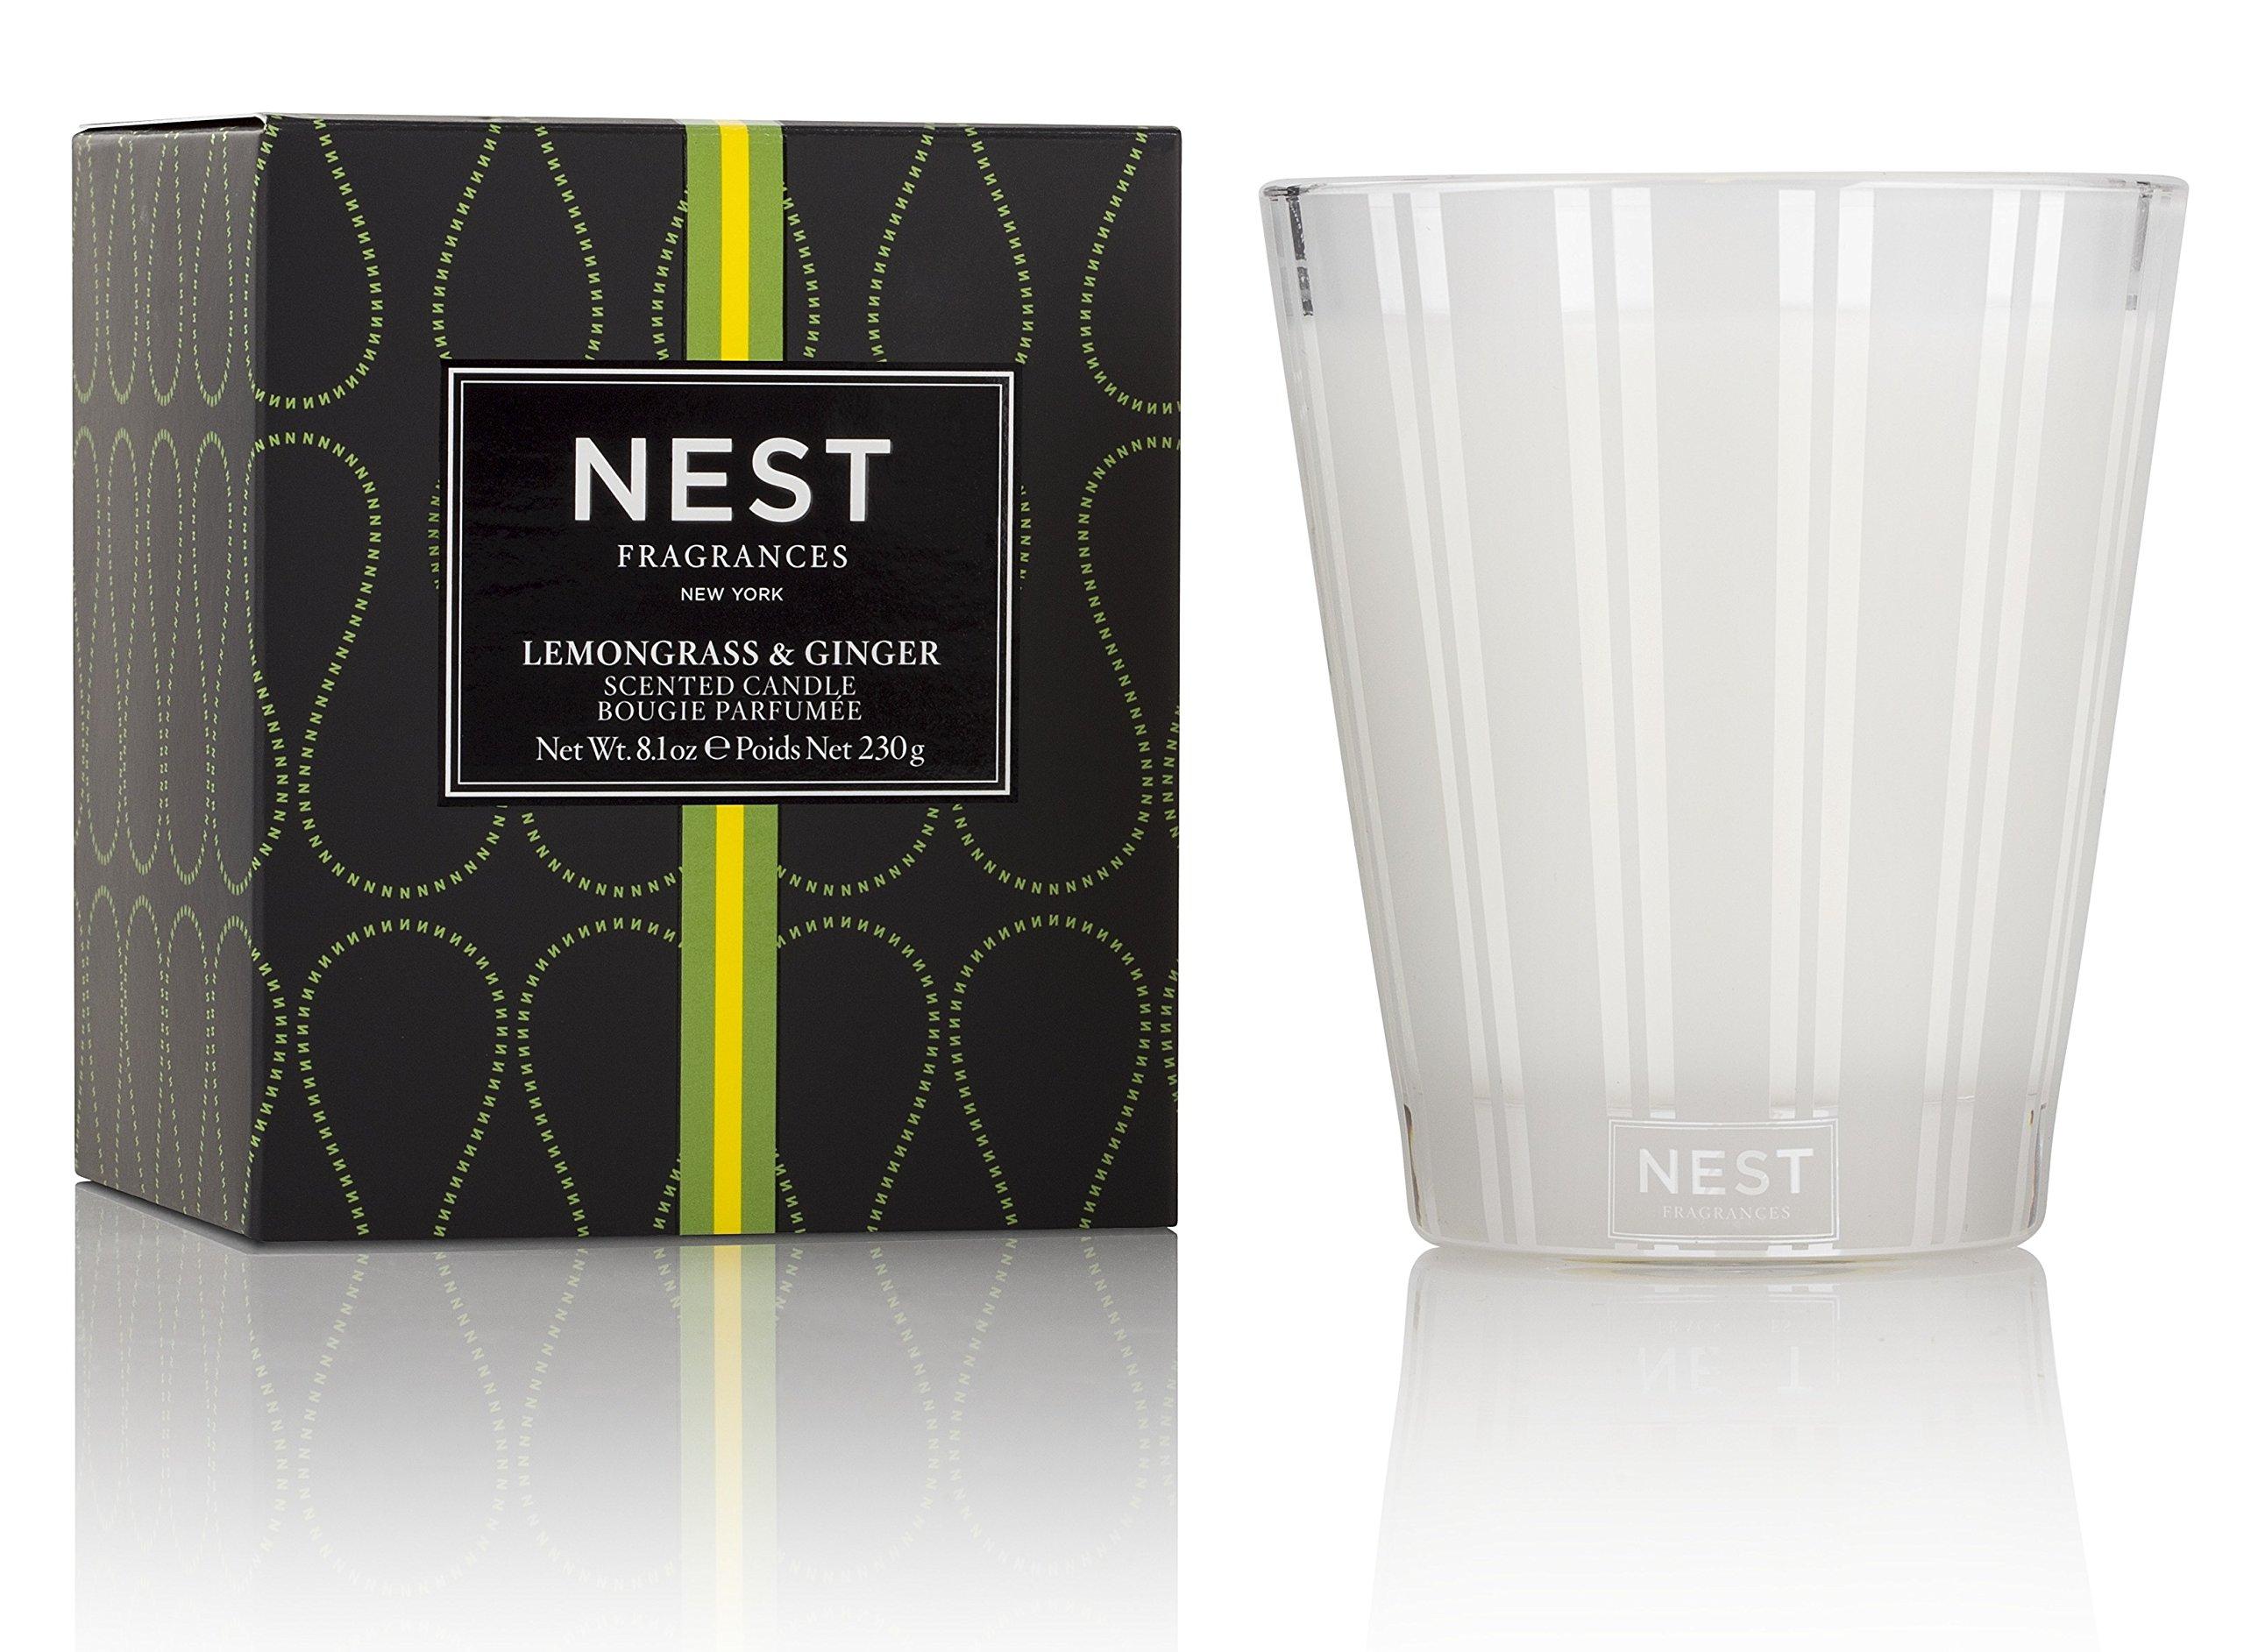 NEST Fragrances NEST01LG003 Classic Candle- Lemongrass & Ginger , 8.1 oz